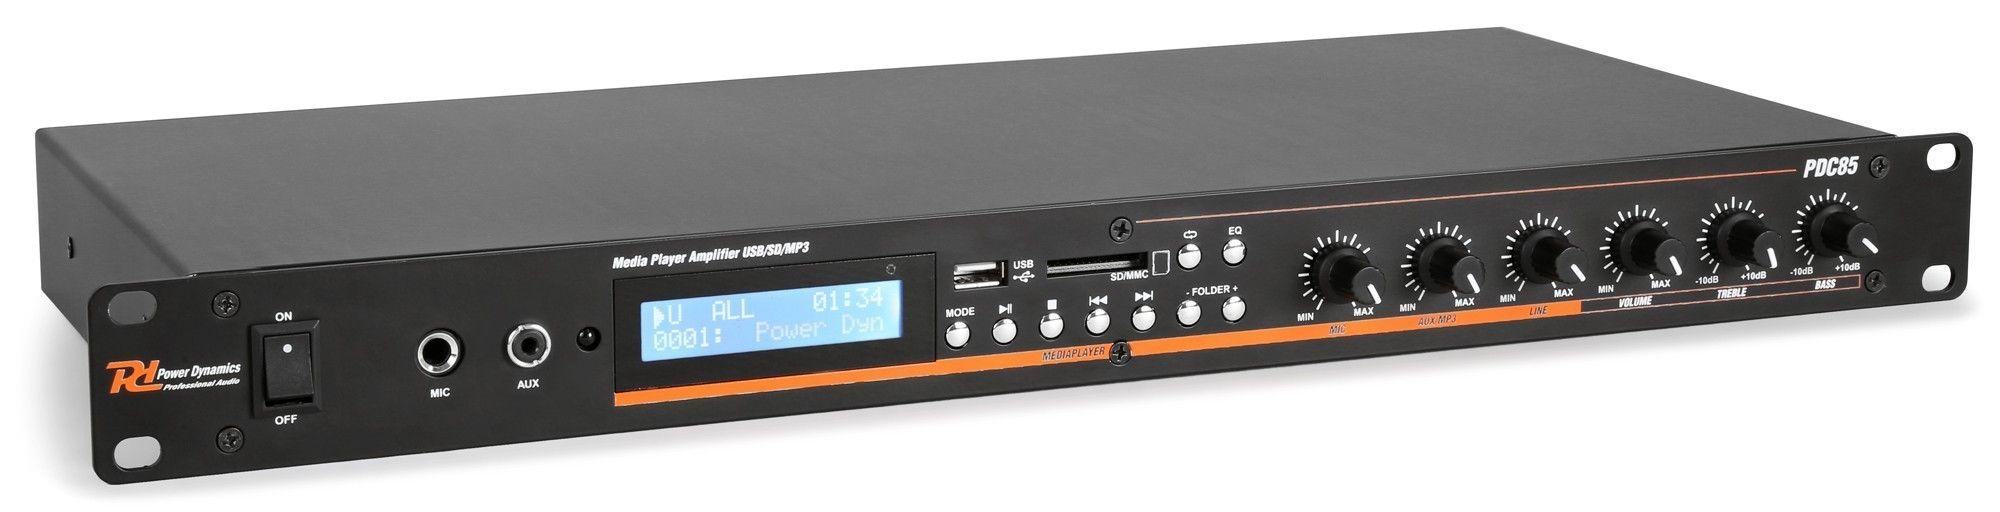 Afbeelding van 2e keus - Power Dynamics PDC85 Bluetooth / USB / SD Mediaspeler met ve...